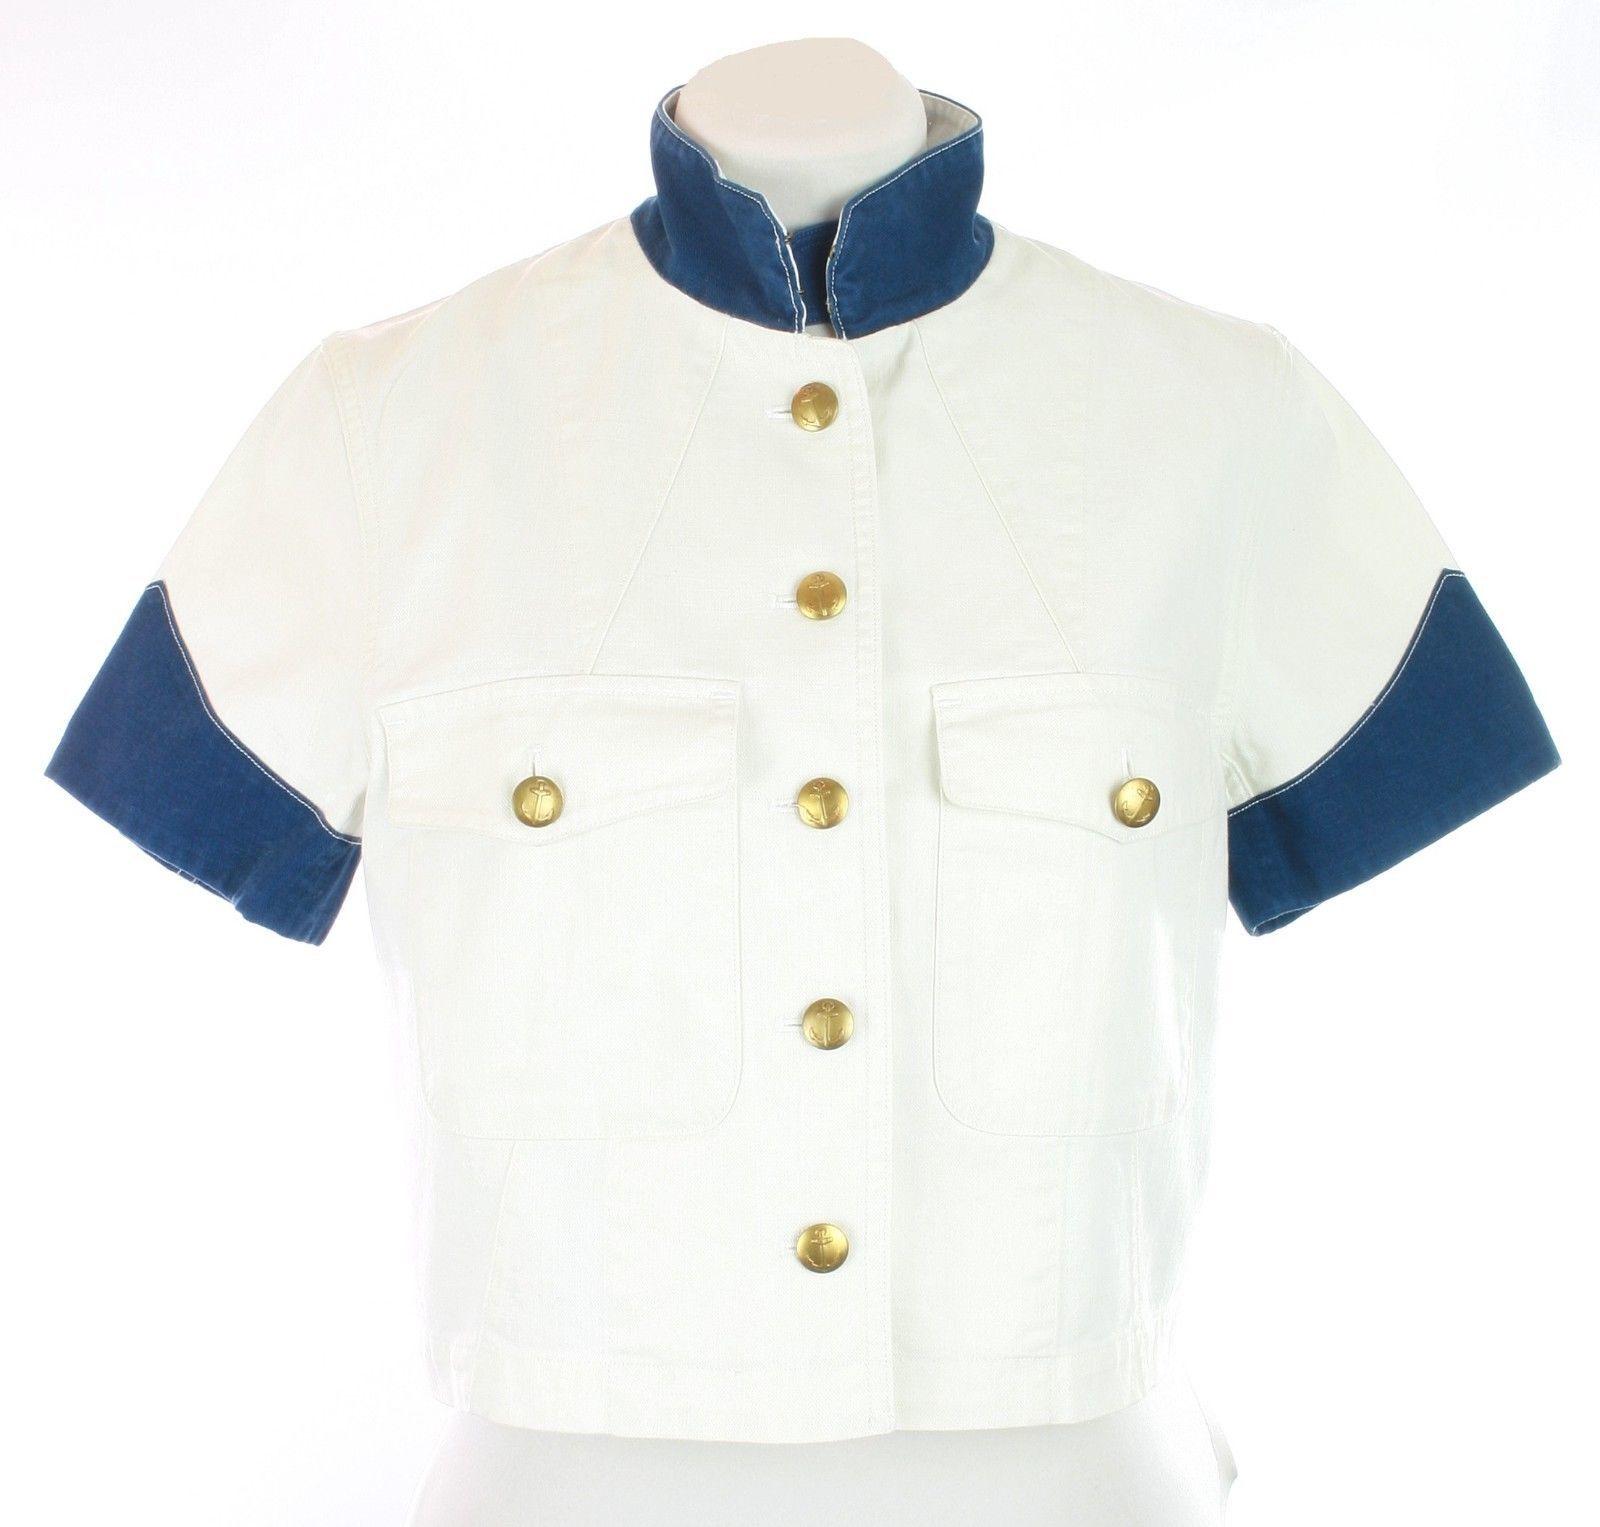 "Ralph Lauren Womens Ladies ""Harmon"" Cream Blazer Jacket UK 8 - 10 RRP £330.00 - $165.90"